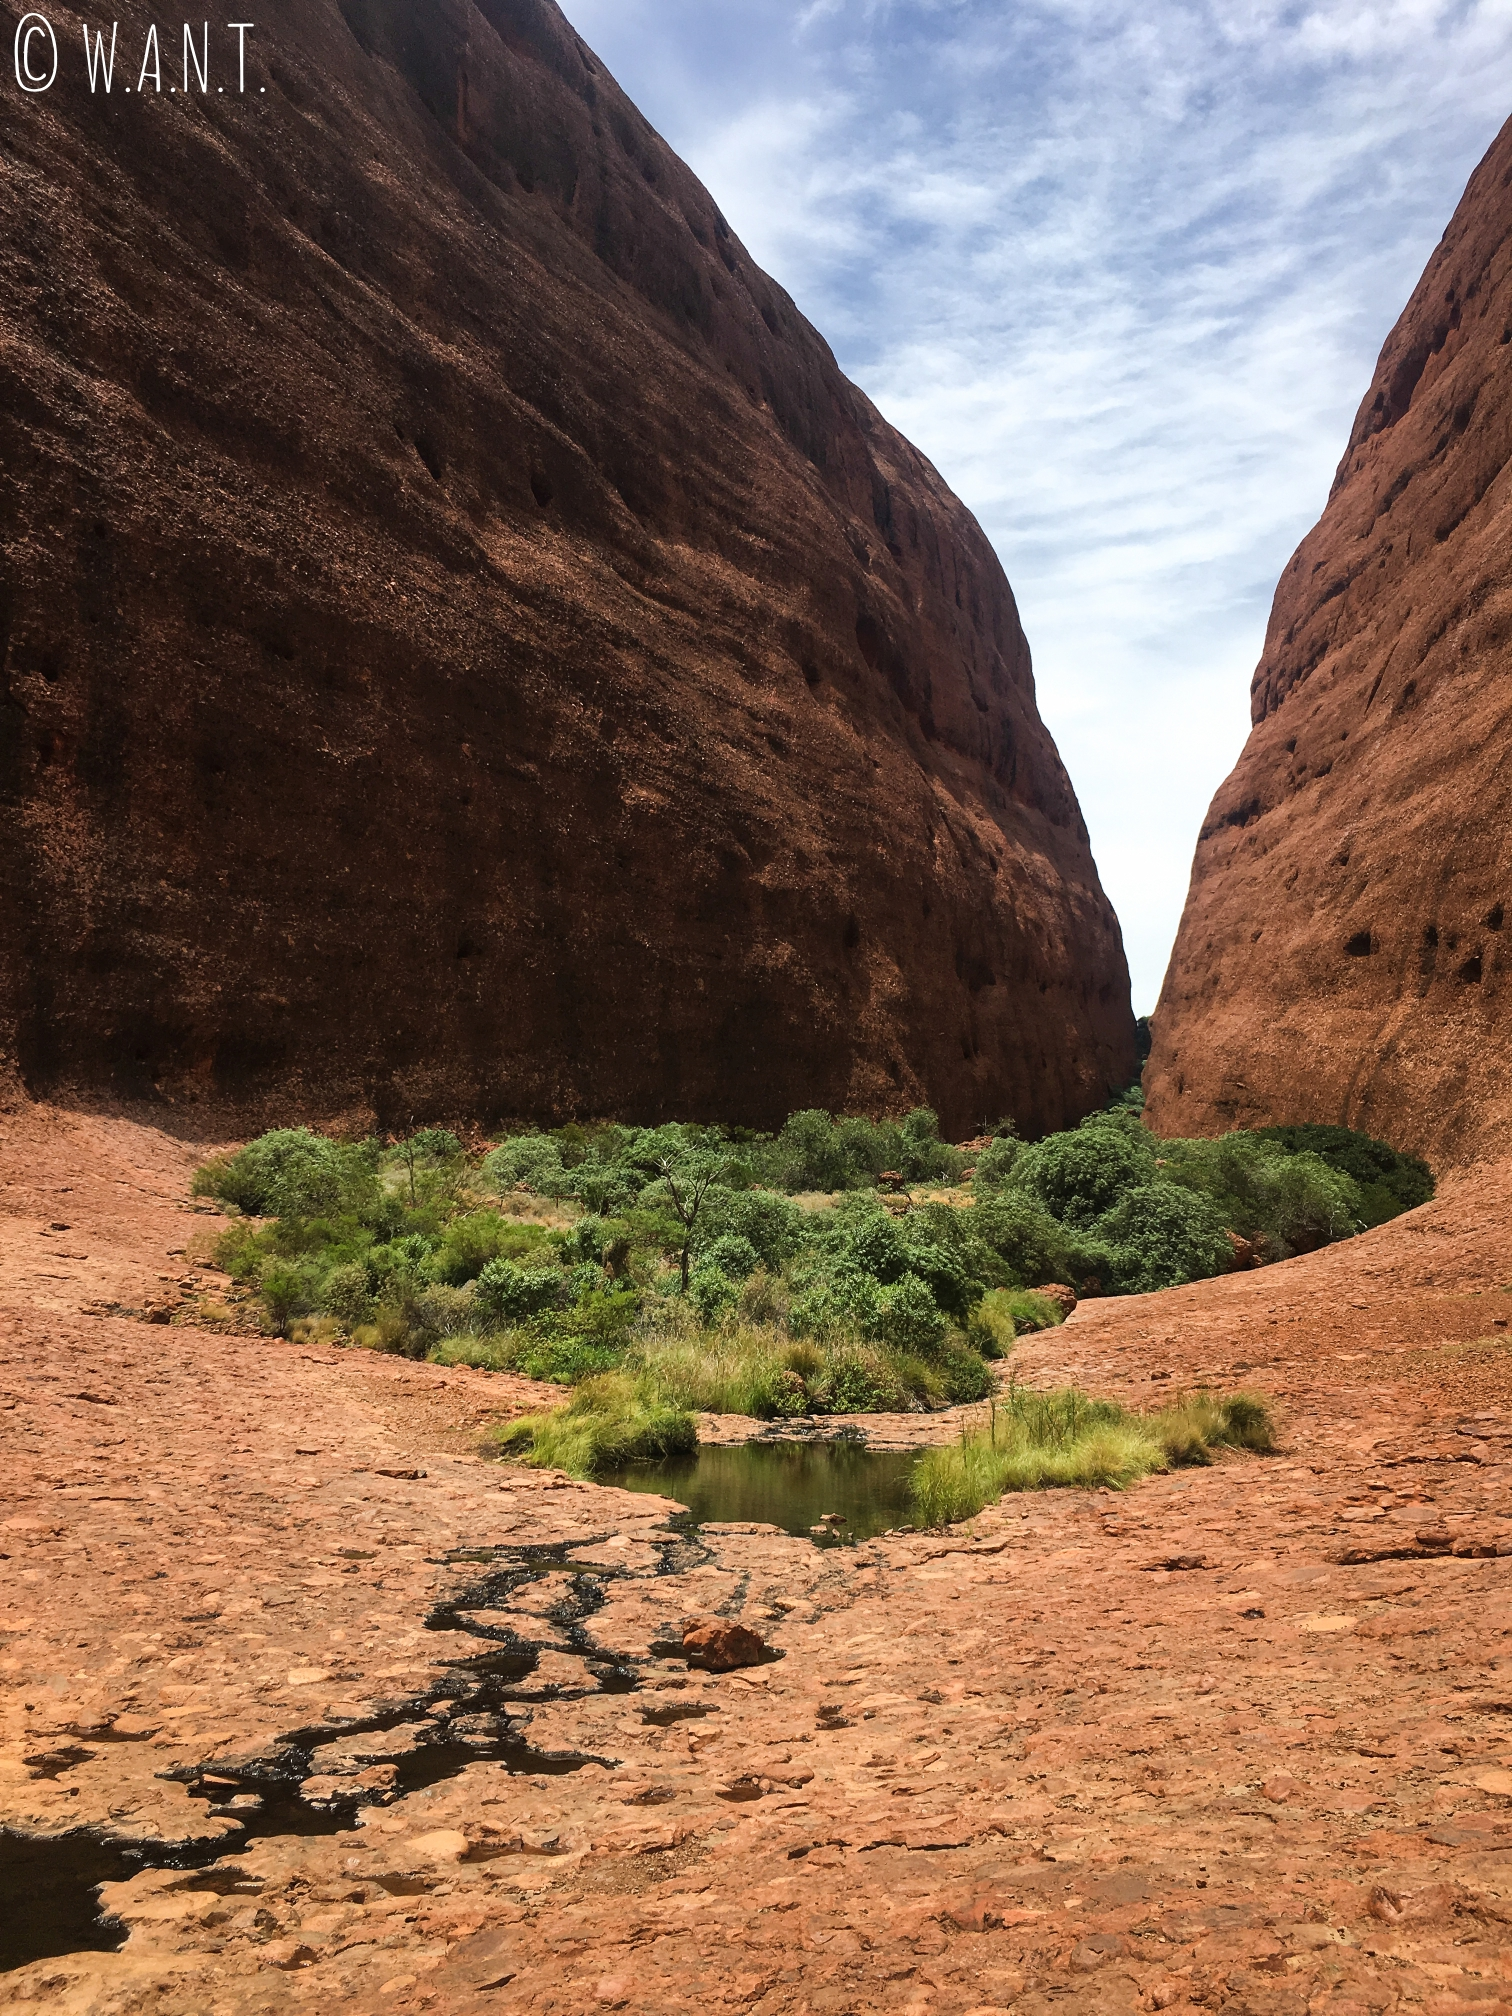 Paysage de la randonnée Walpa Gorge dans le parc national Uluru-Kata Tjuta